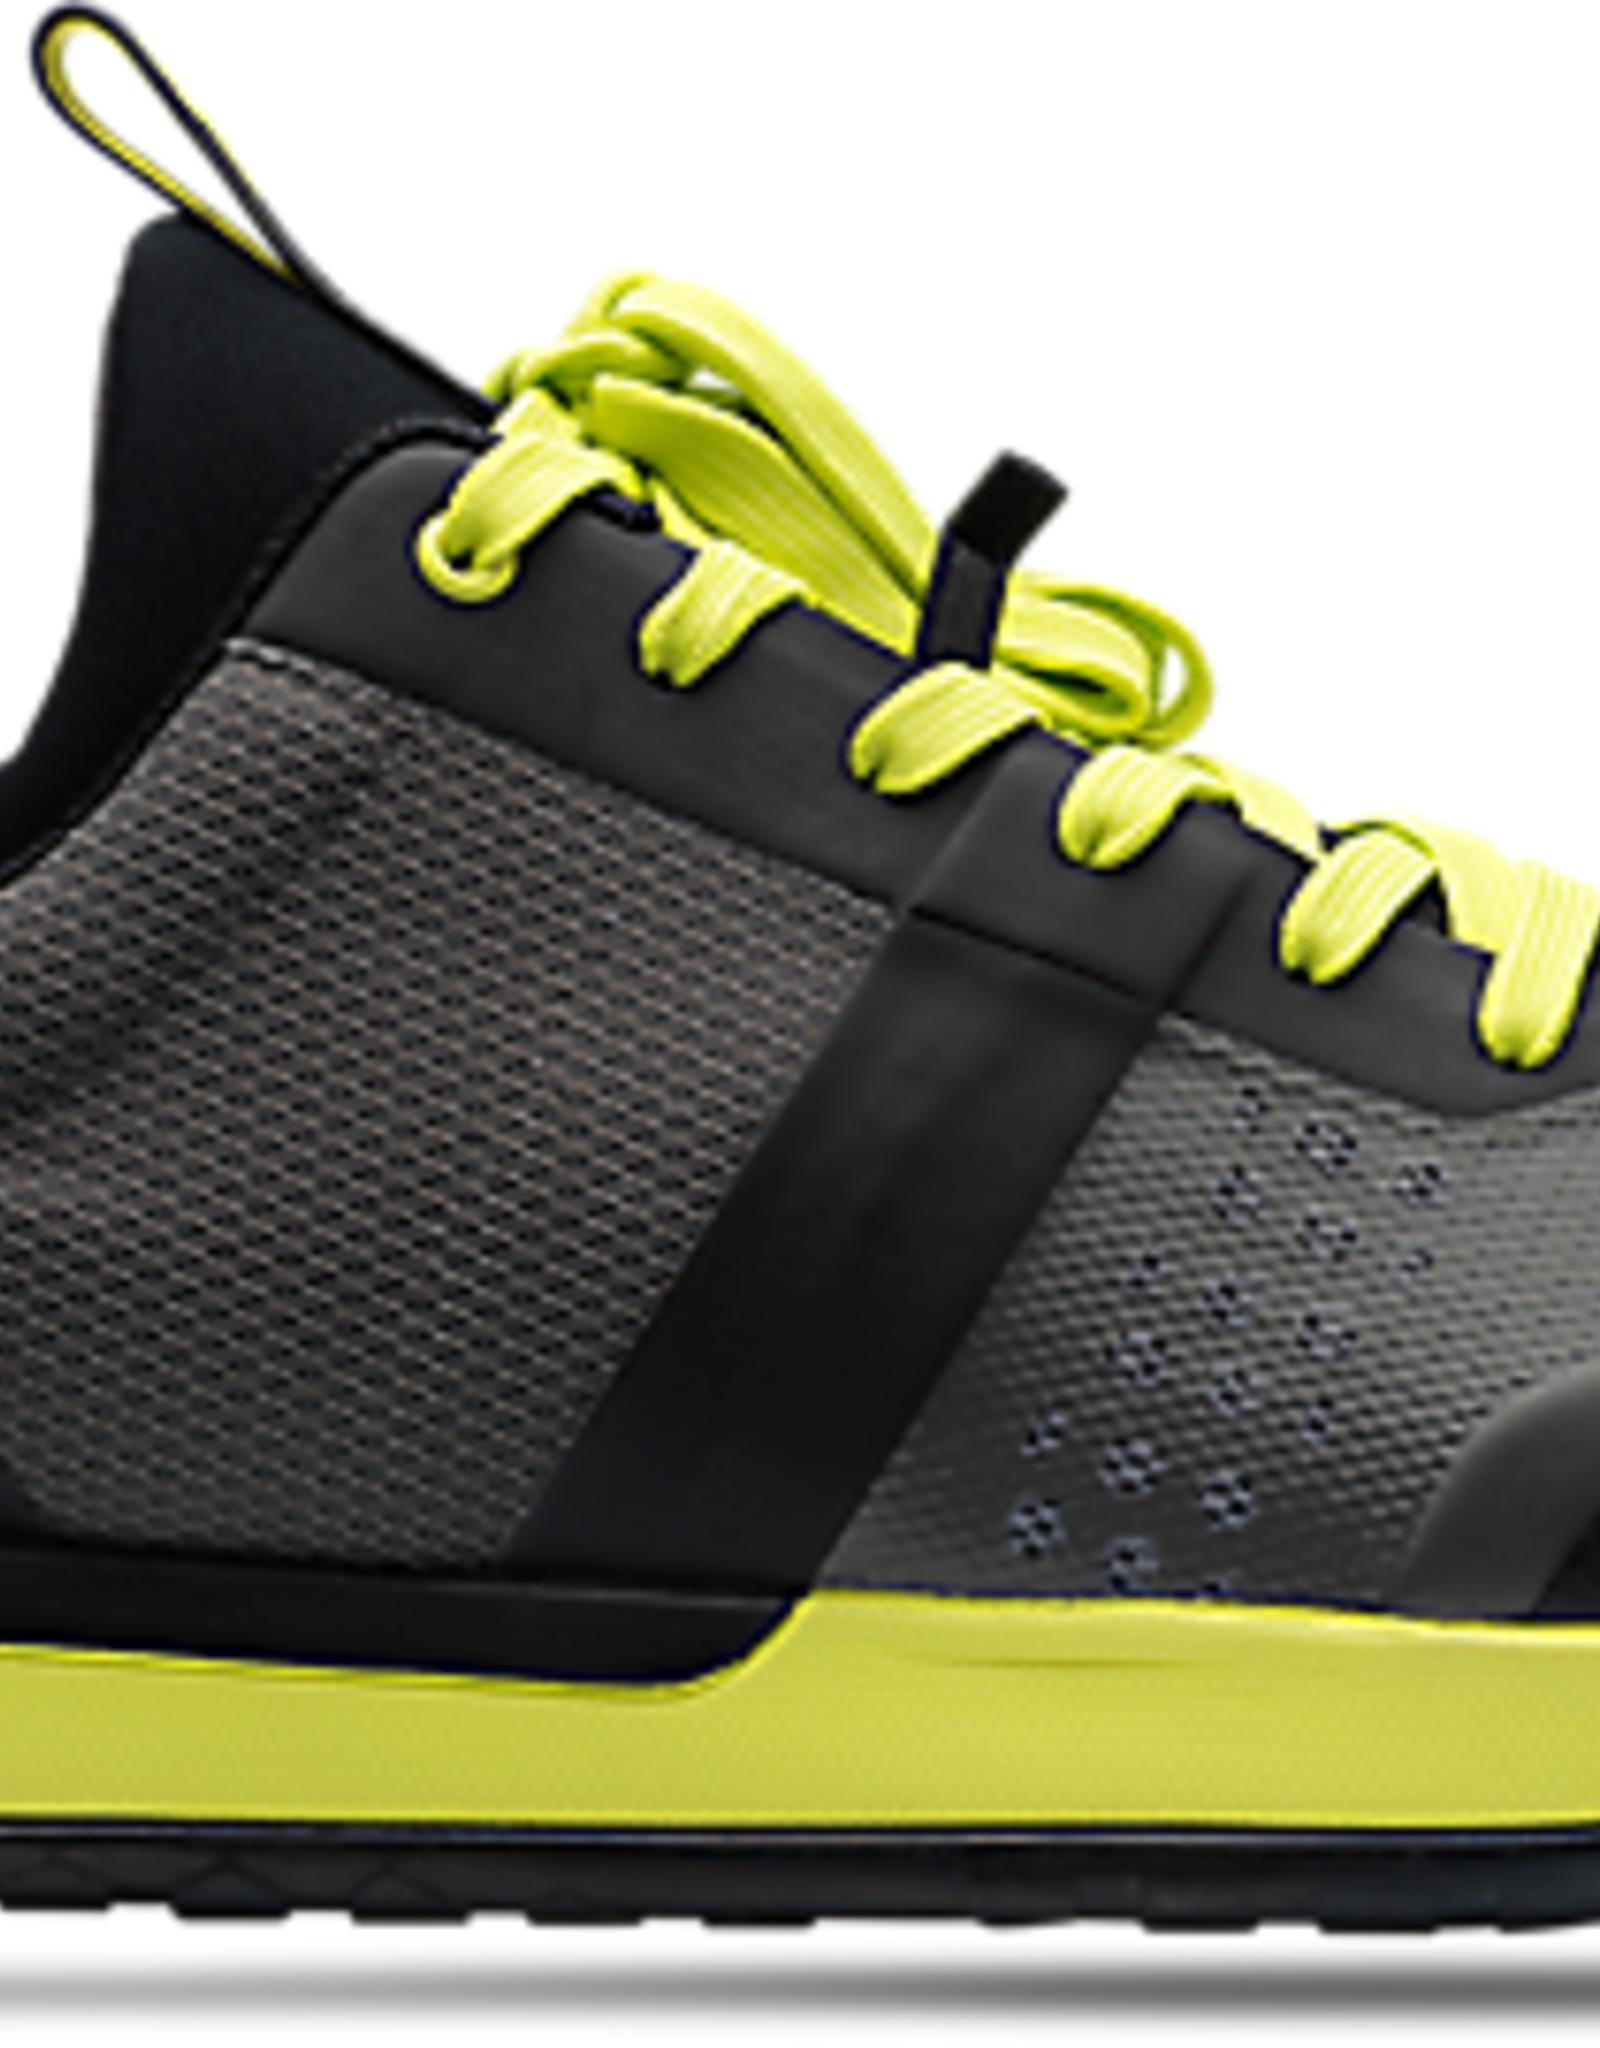 Specialized 2FO Flat 1.0 MTB Shoe